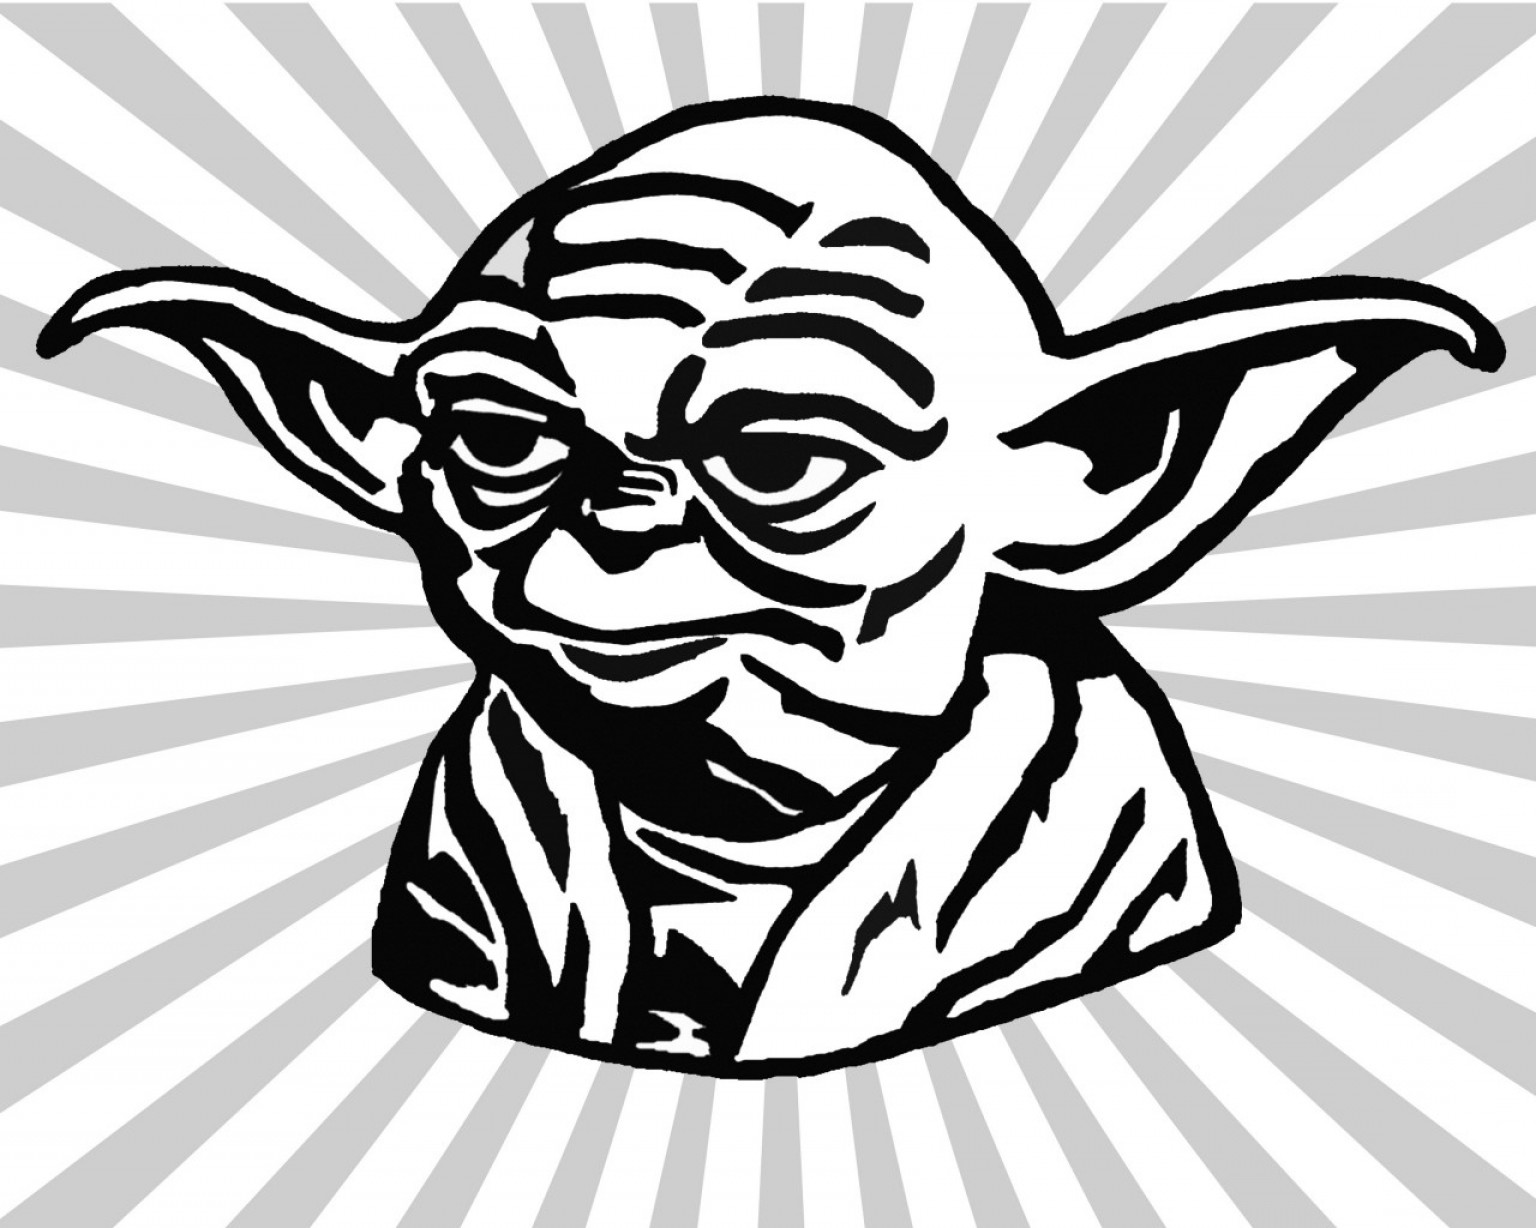 Chic Design Yoda Clipart Cartoon Vector Art Graphics Freevector Com.